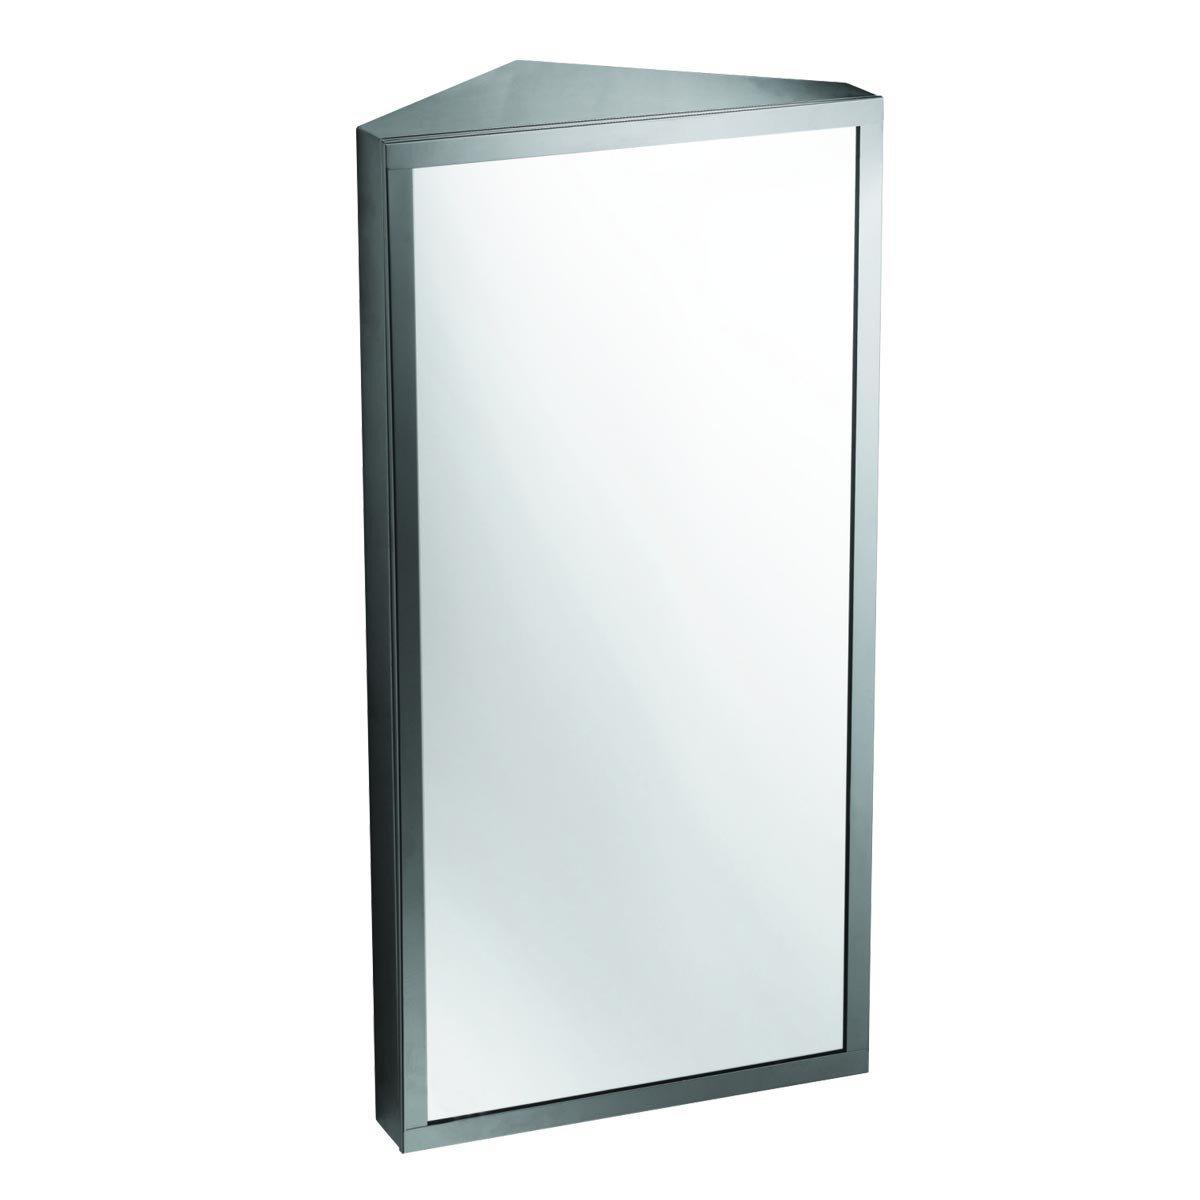 Brushed Stainless Steel Medicine Cabinet Corner Wall Mount | Renovator's Supply